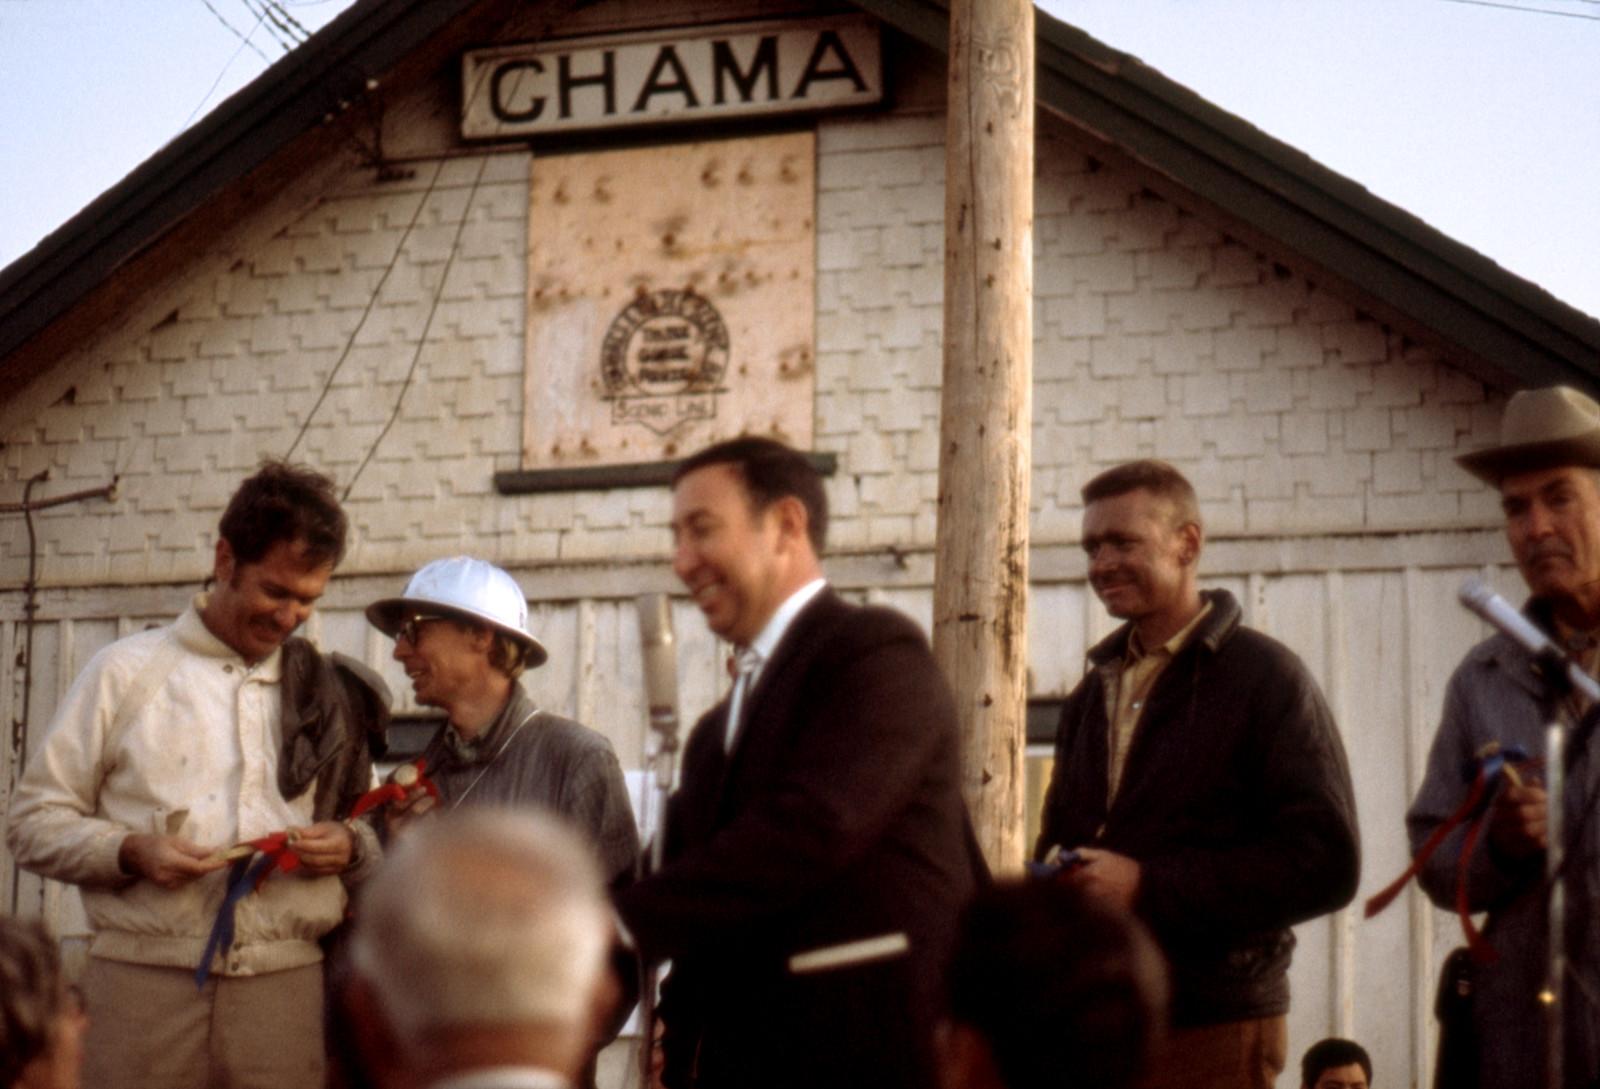 1970-09-06 C&TS Chama s09.jpg